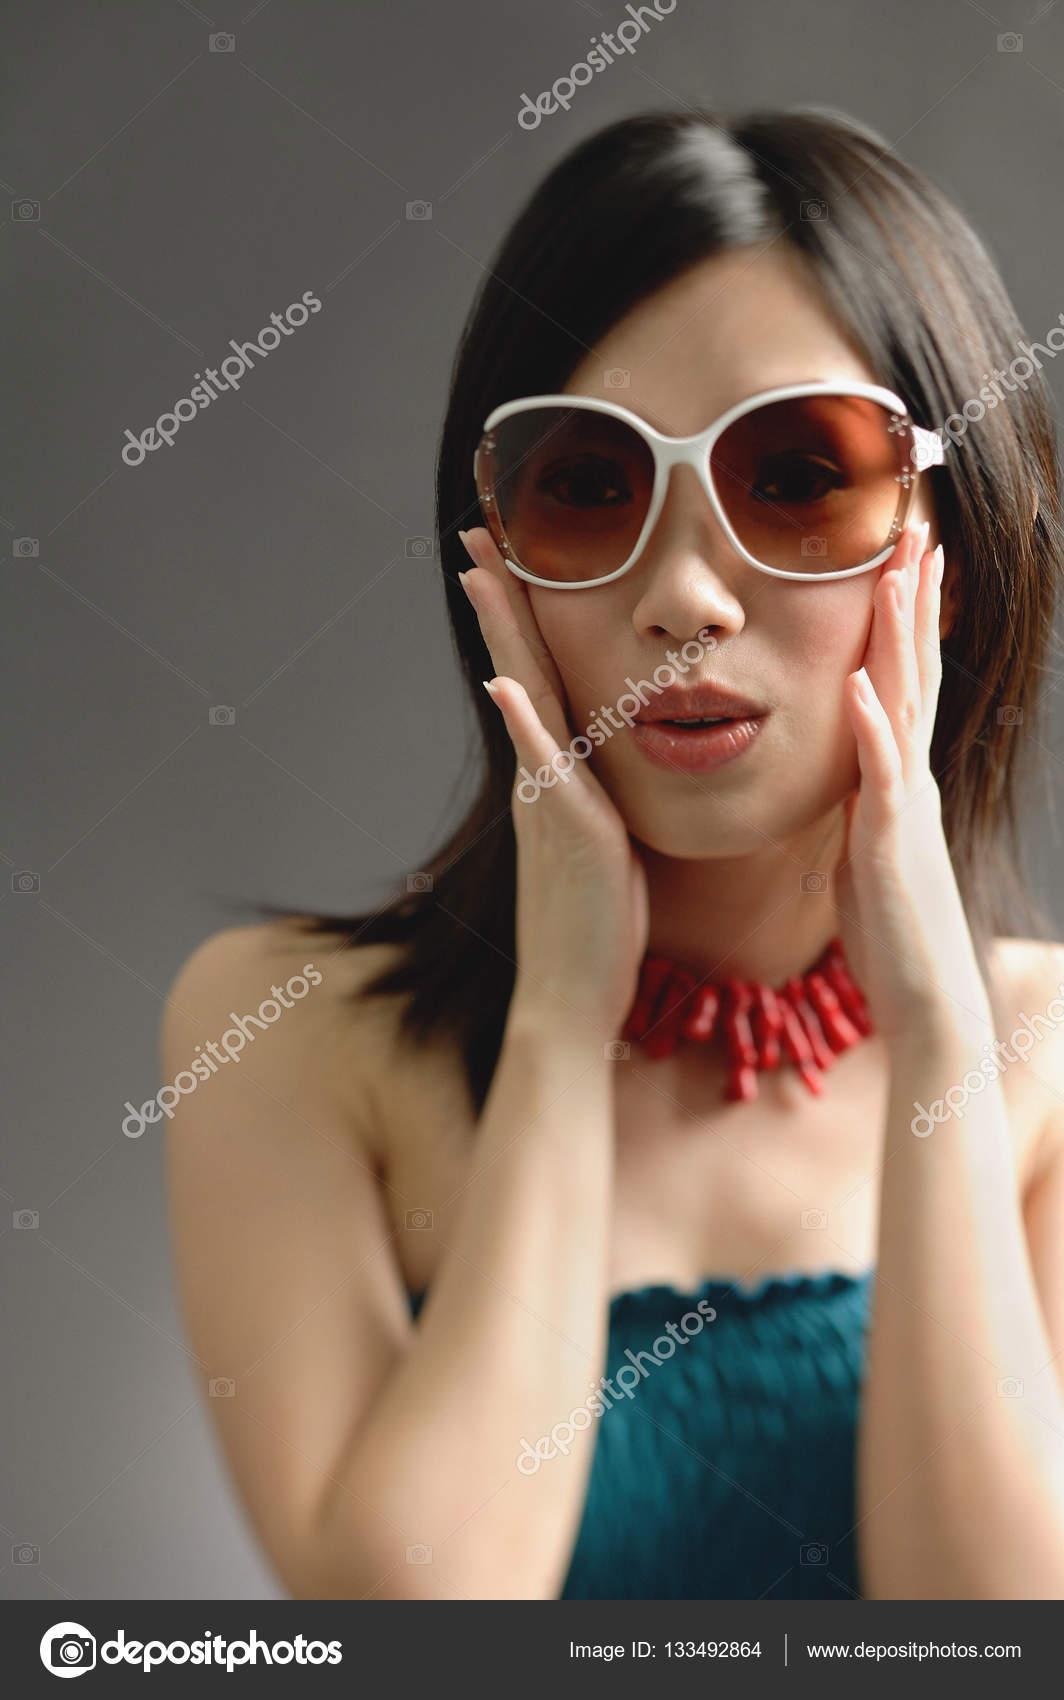 ad9995f570 Γυναίκα που φοράει μεγάλα γυαλιά ηλίου